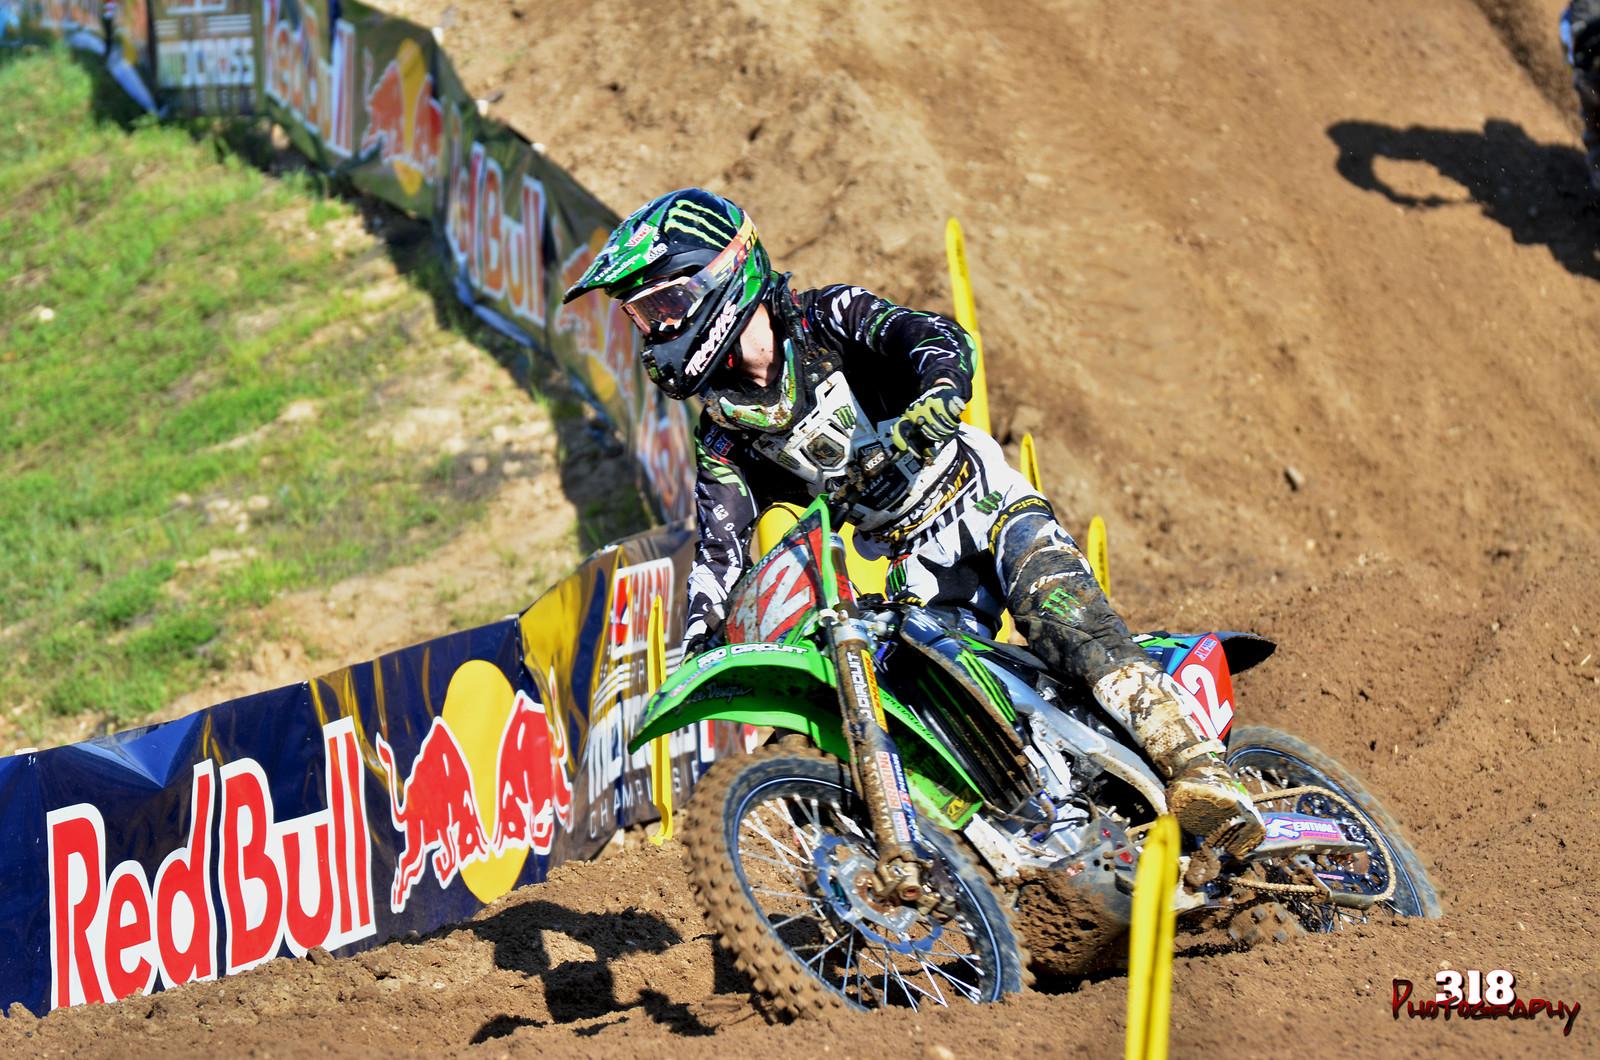 12-02 - MxPro318 - Motocross Pictures - Vital MX